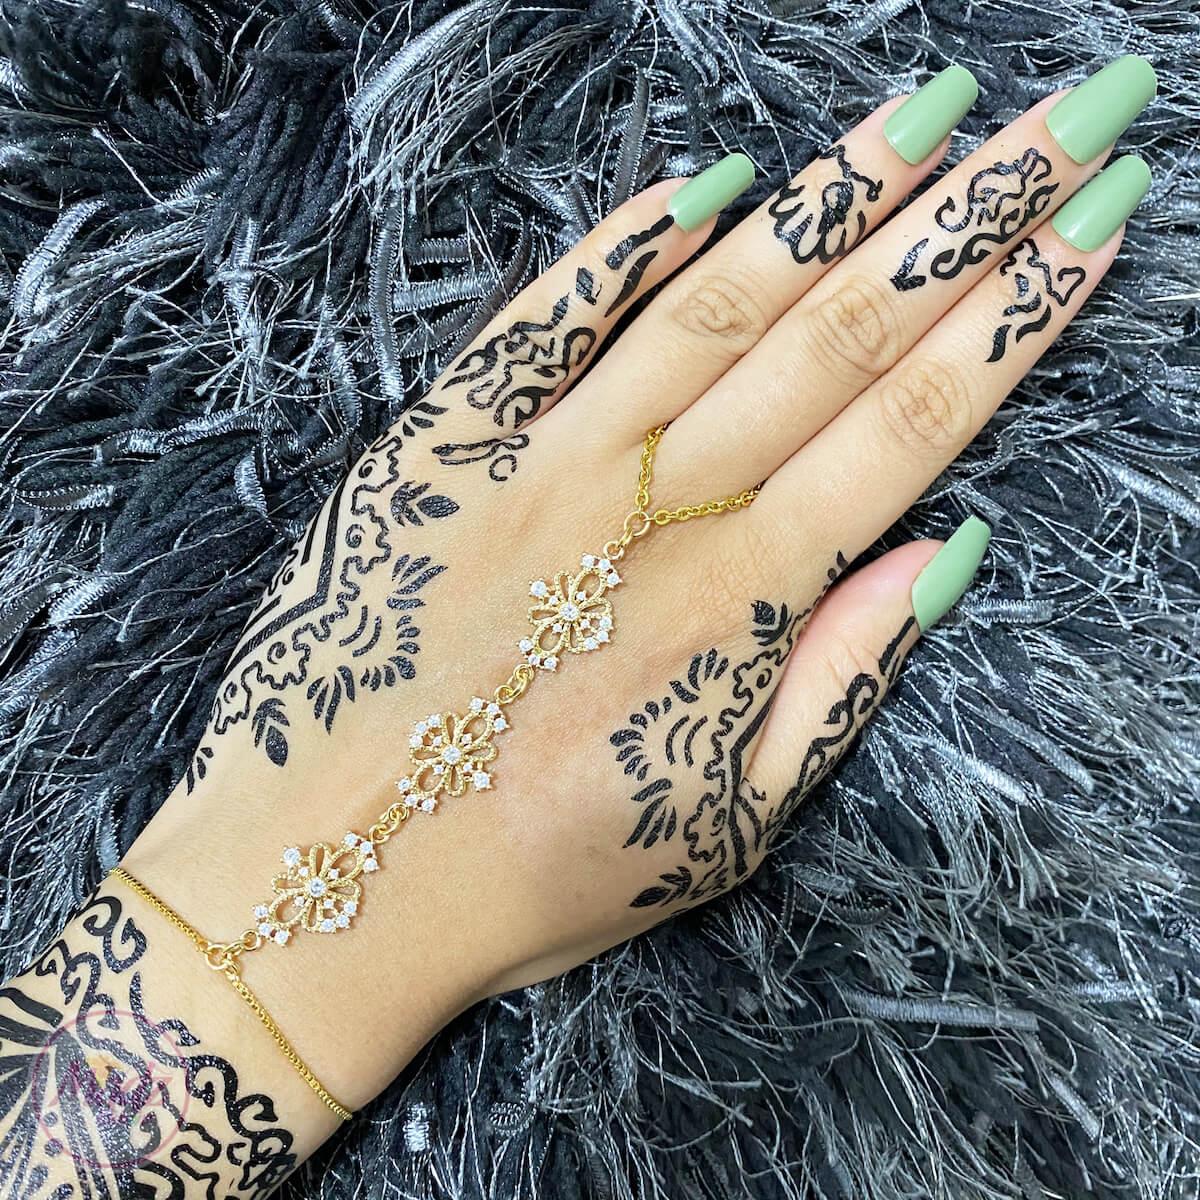 Gold White Hand Chain , Hand Ring Bracelet , Gold Crystal Chain Bracelet , Attach Ring Bracelet , Bridesmaid Gift , Hand Jewelry, Body Jewelry , Bridal hand piece , hand harness , Dainty Bracelet , Zircon Bracelet , Parisa Slave Bracelet